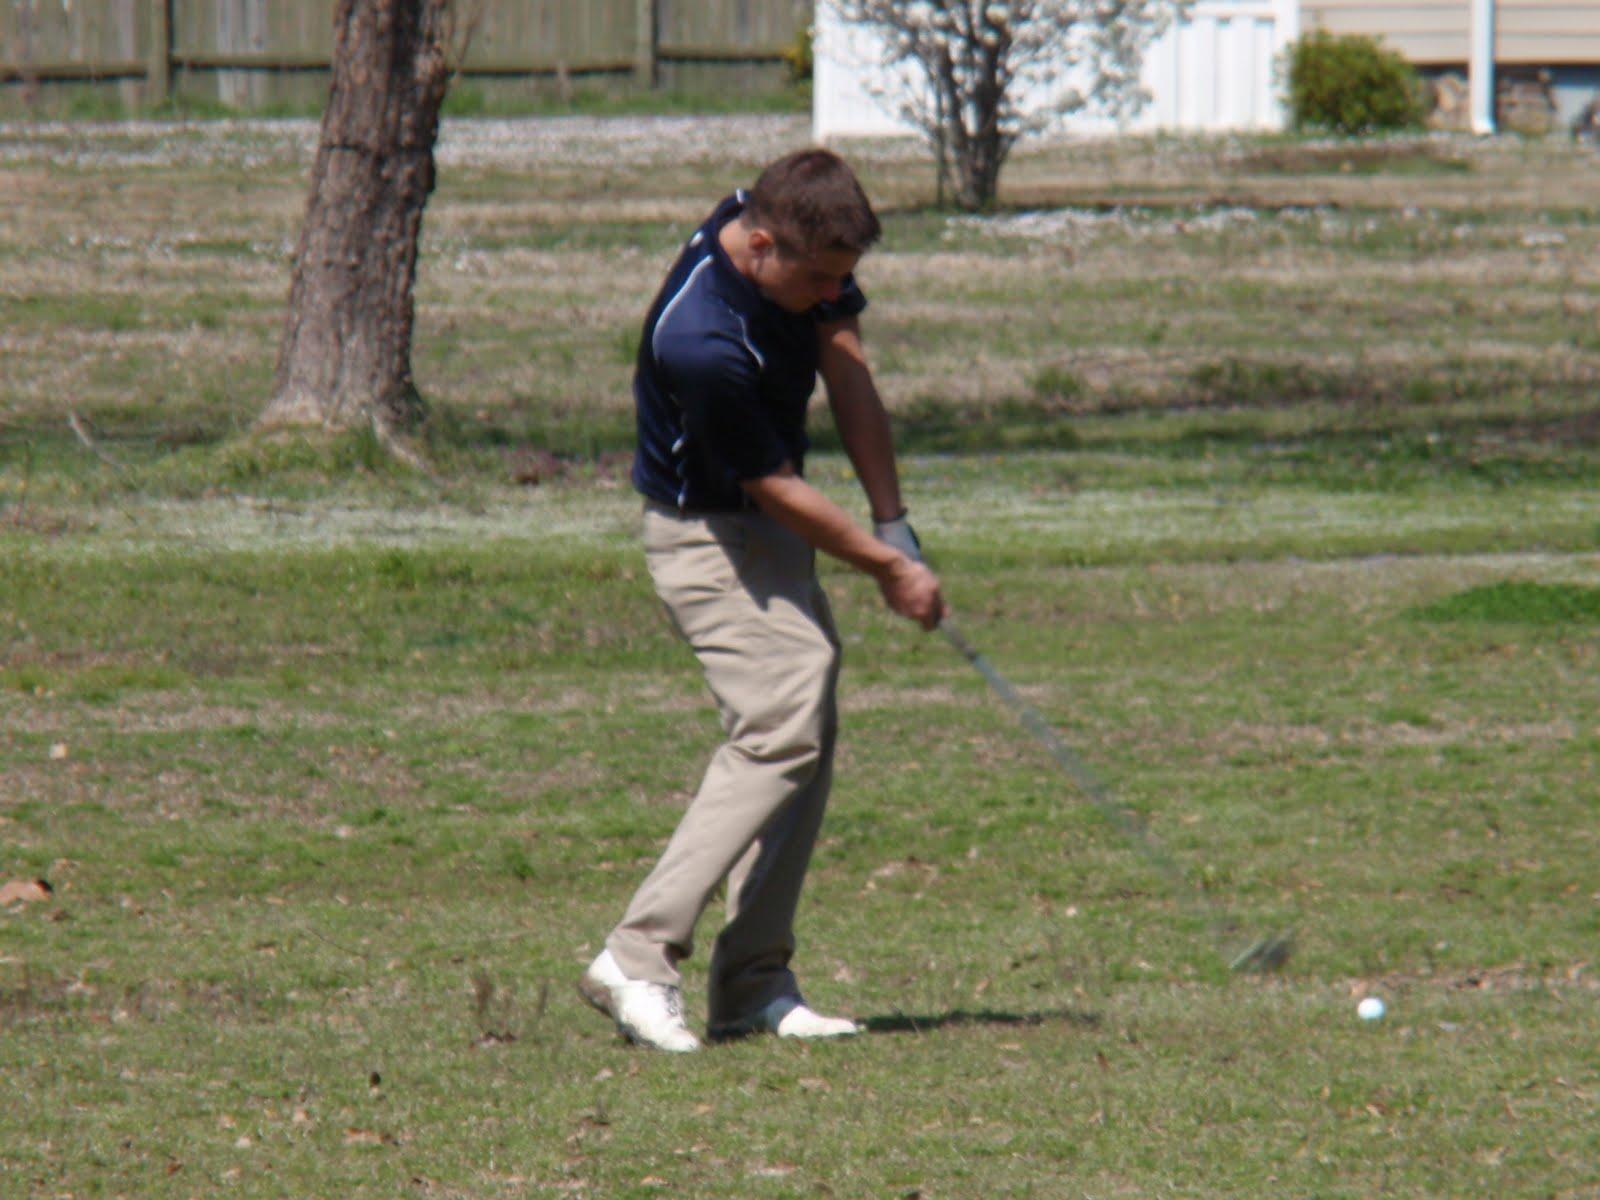 Tournament Practice Round Home Course Golfwrx Site Www Golfwrx Com